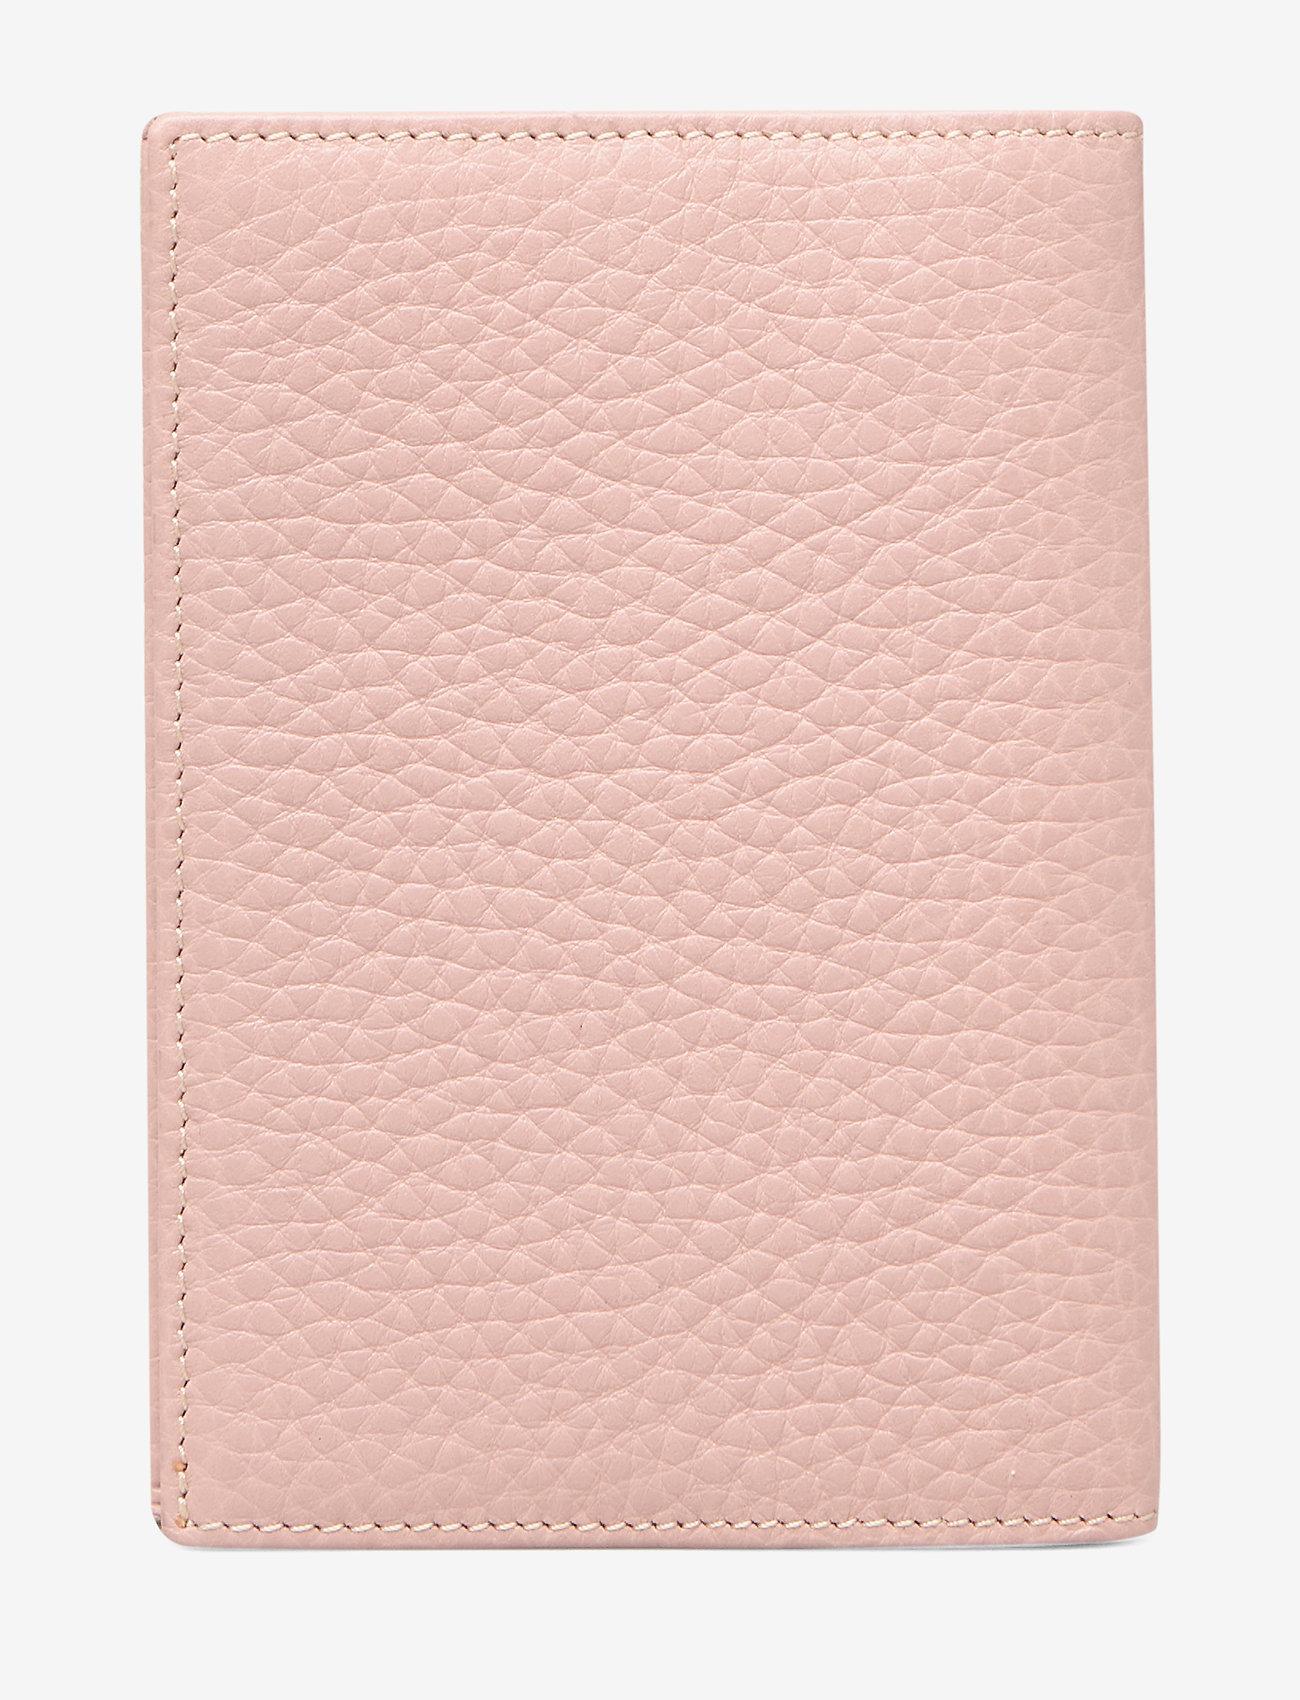 Nelly Passport Cover (Soft Pink) (40 €) - Decadent C5ihg